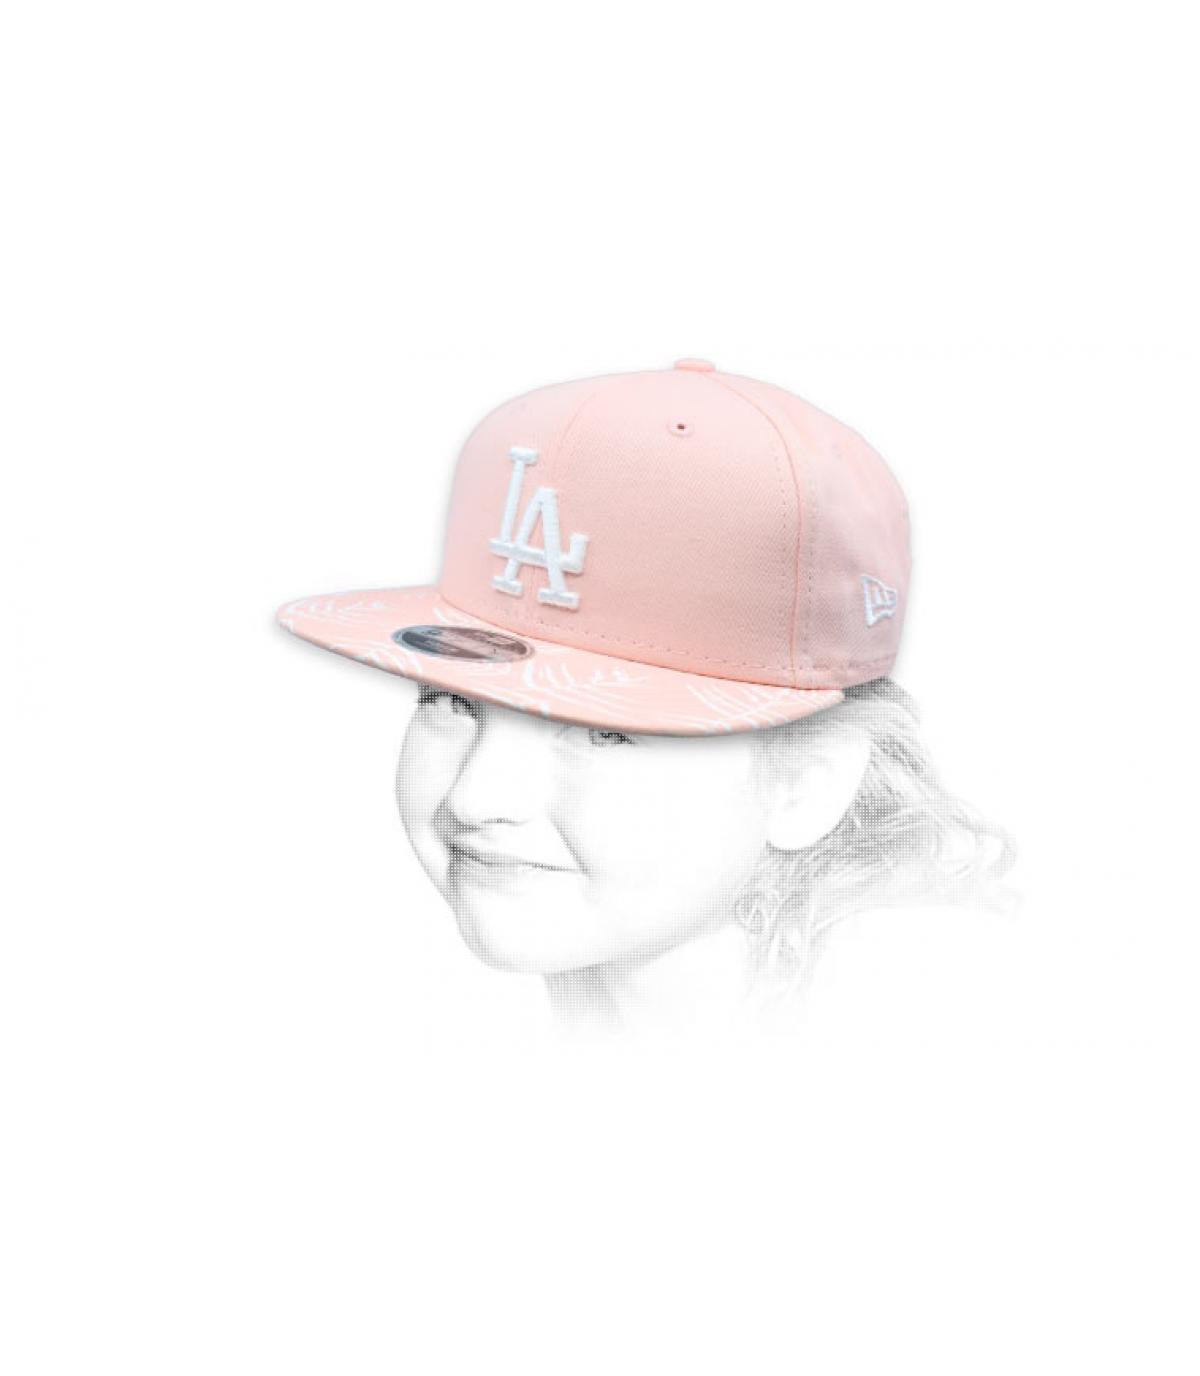 Kinder Snapback LA rosa